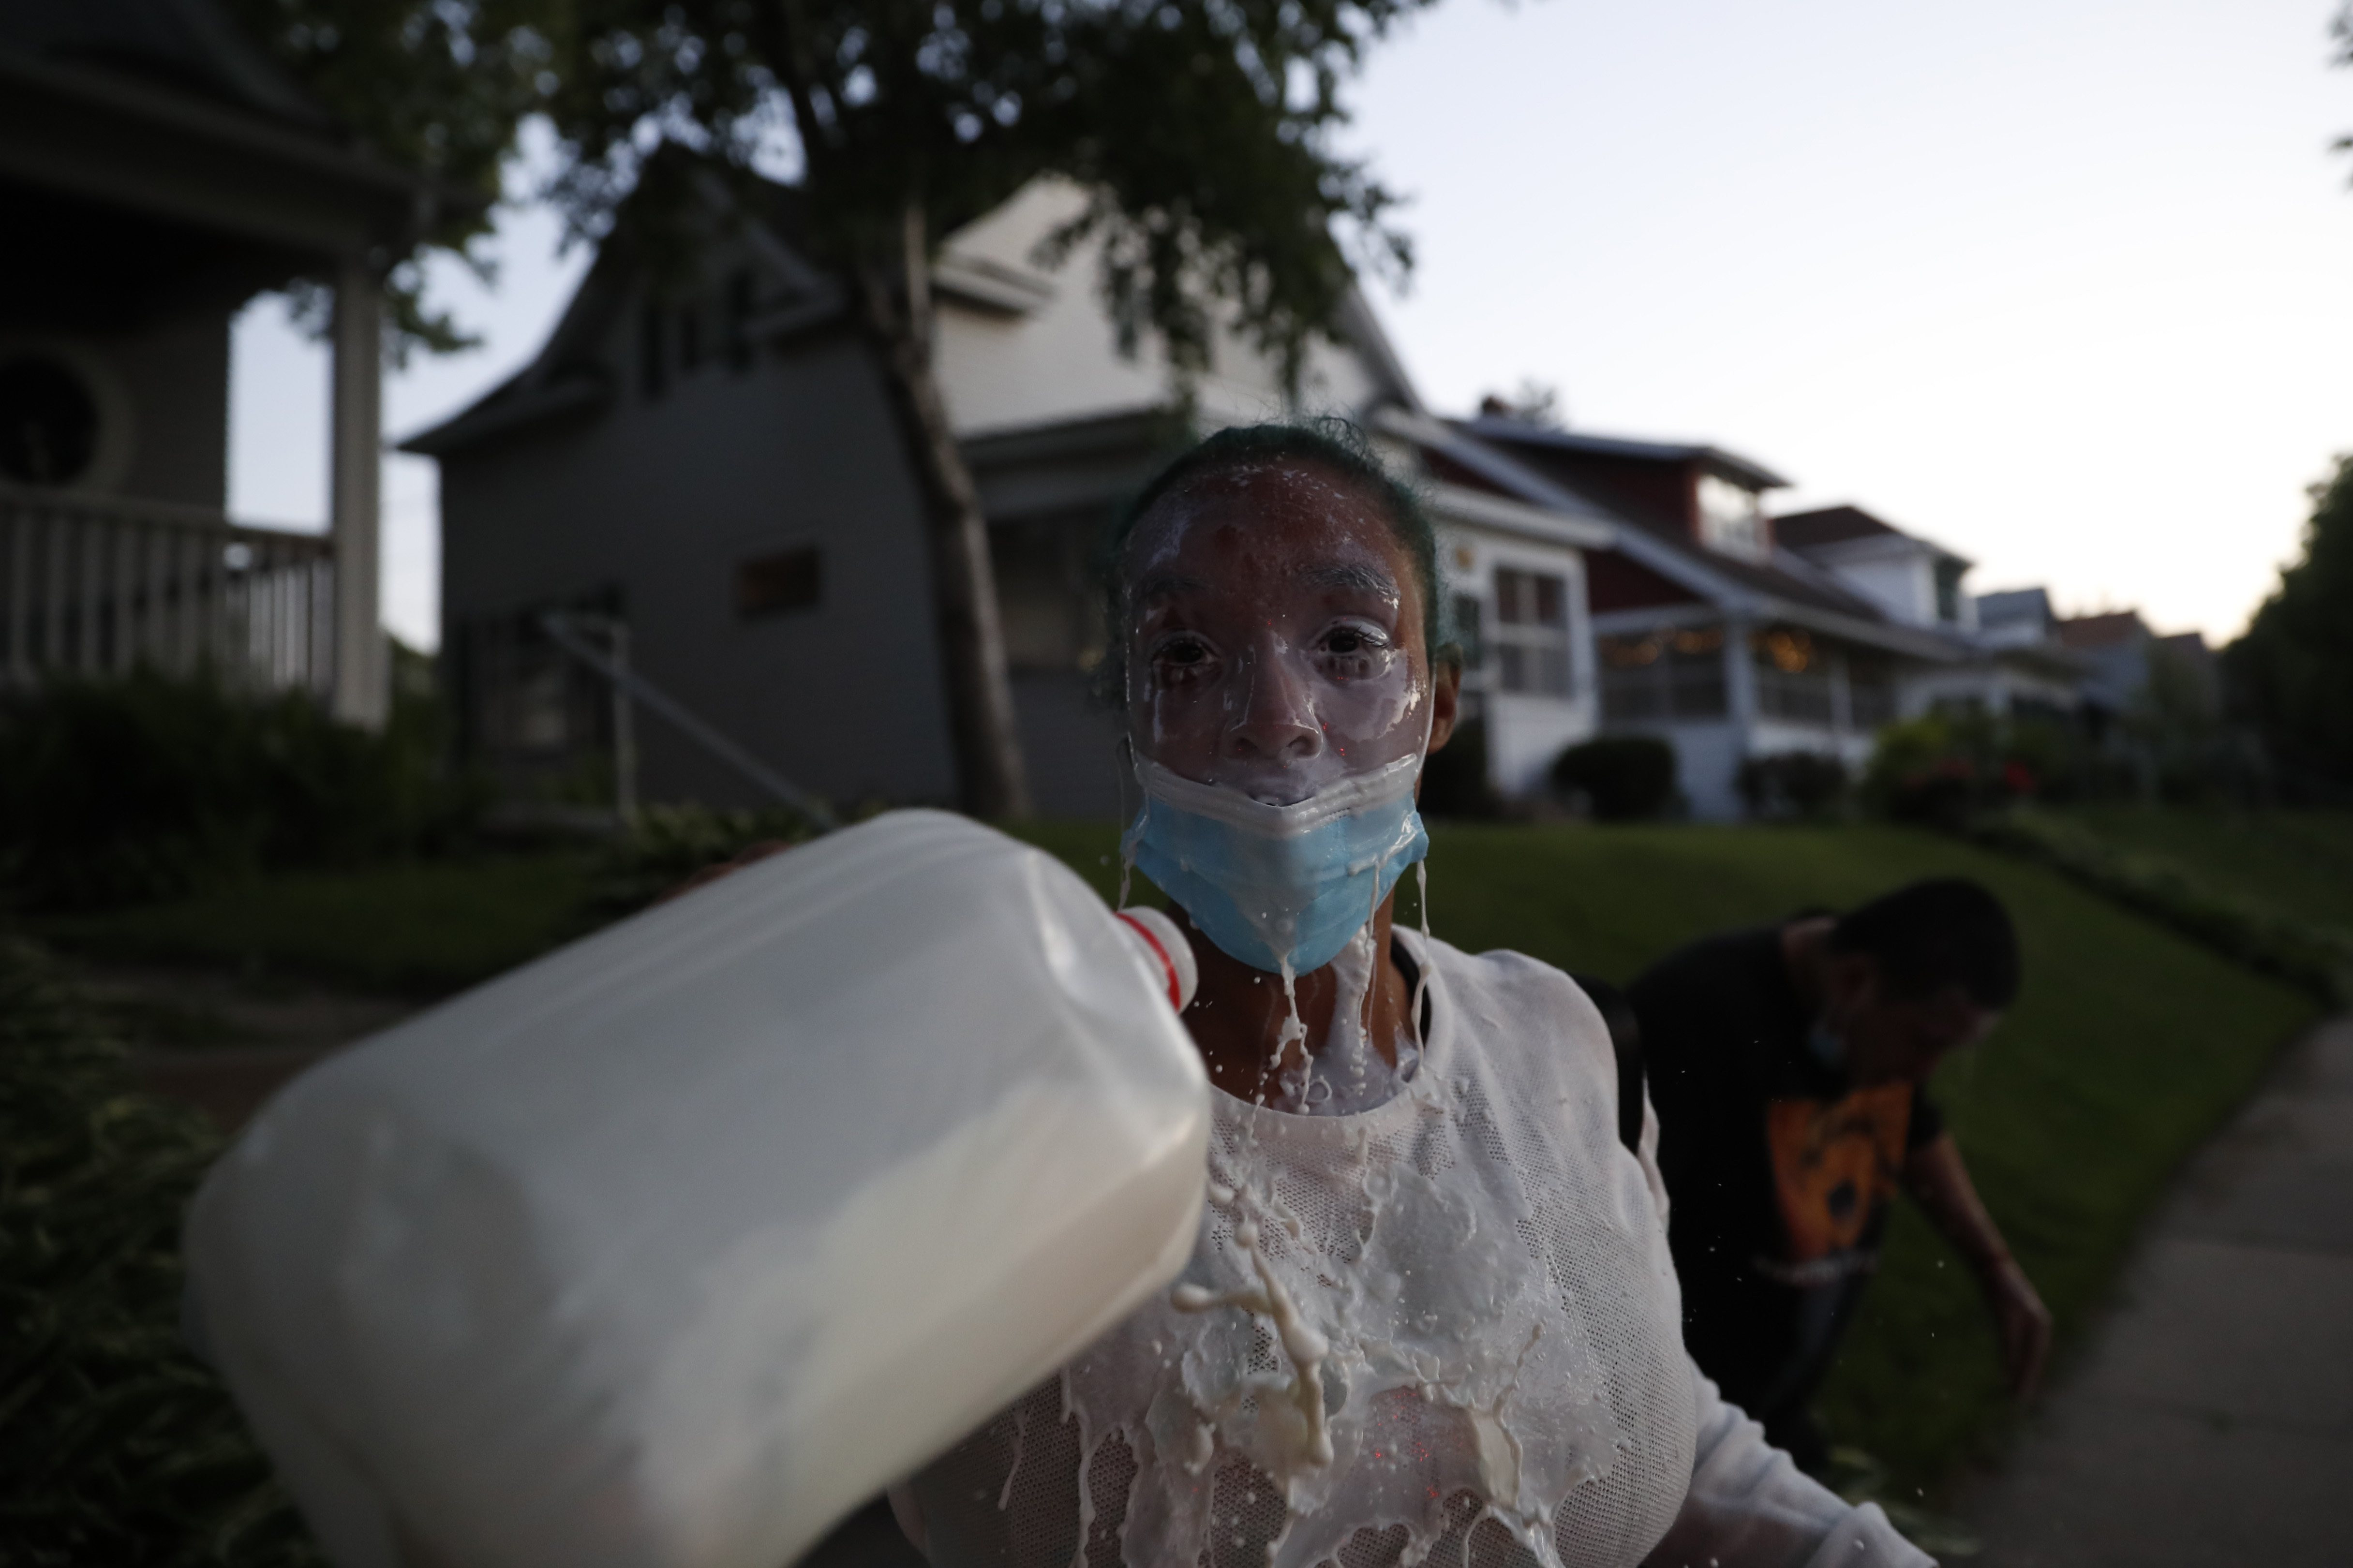 Una manifestante se lava los ojos con leche en St. Paul, Minnesota (AP Photo/John Minchillo)